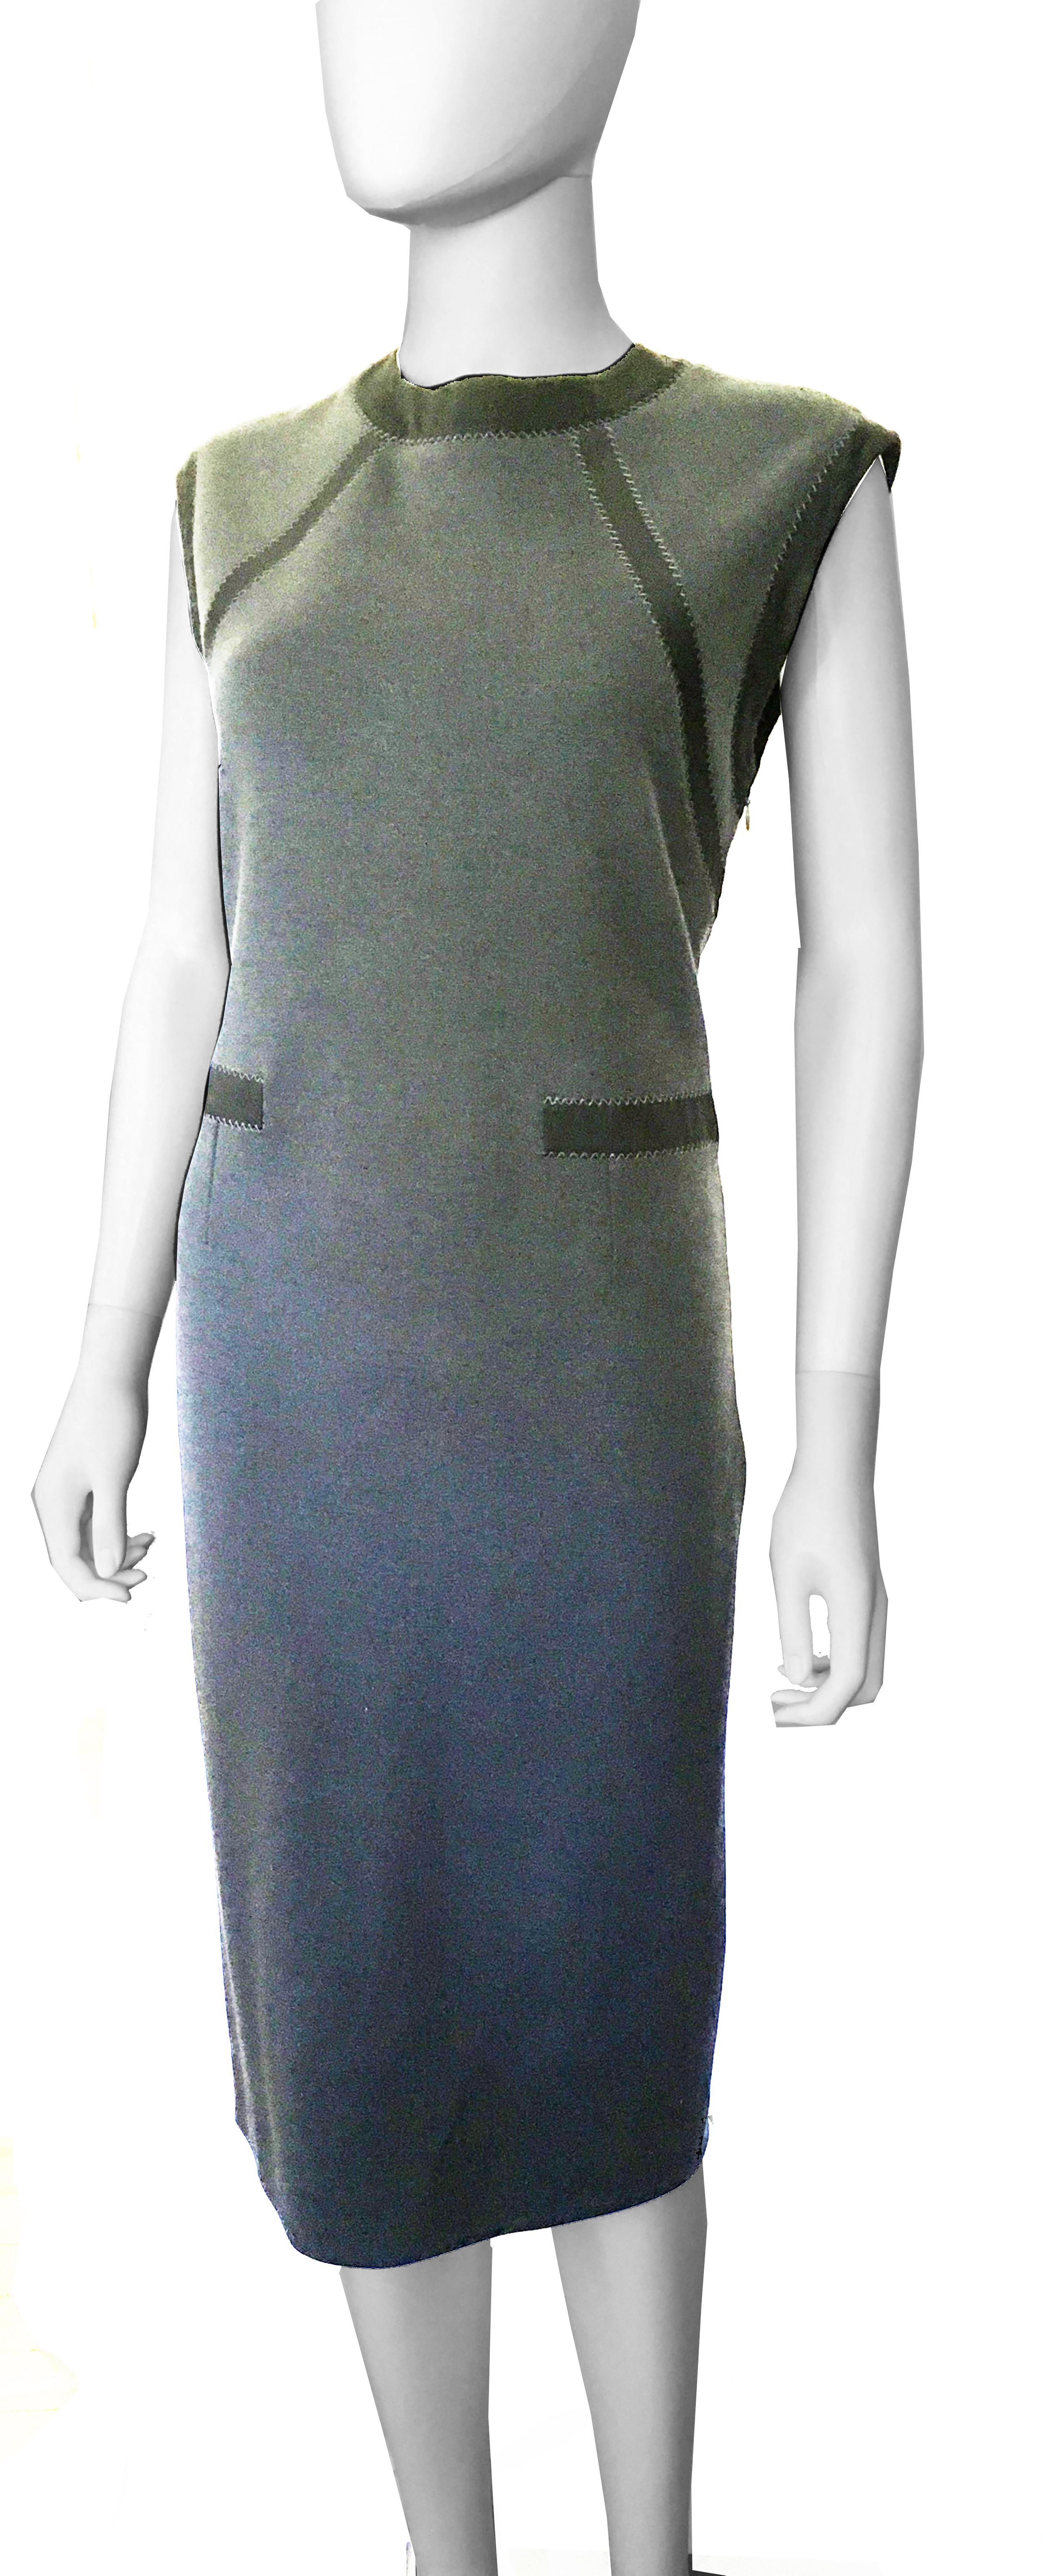 Bottega Veneta Grey Wool Jersey dress